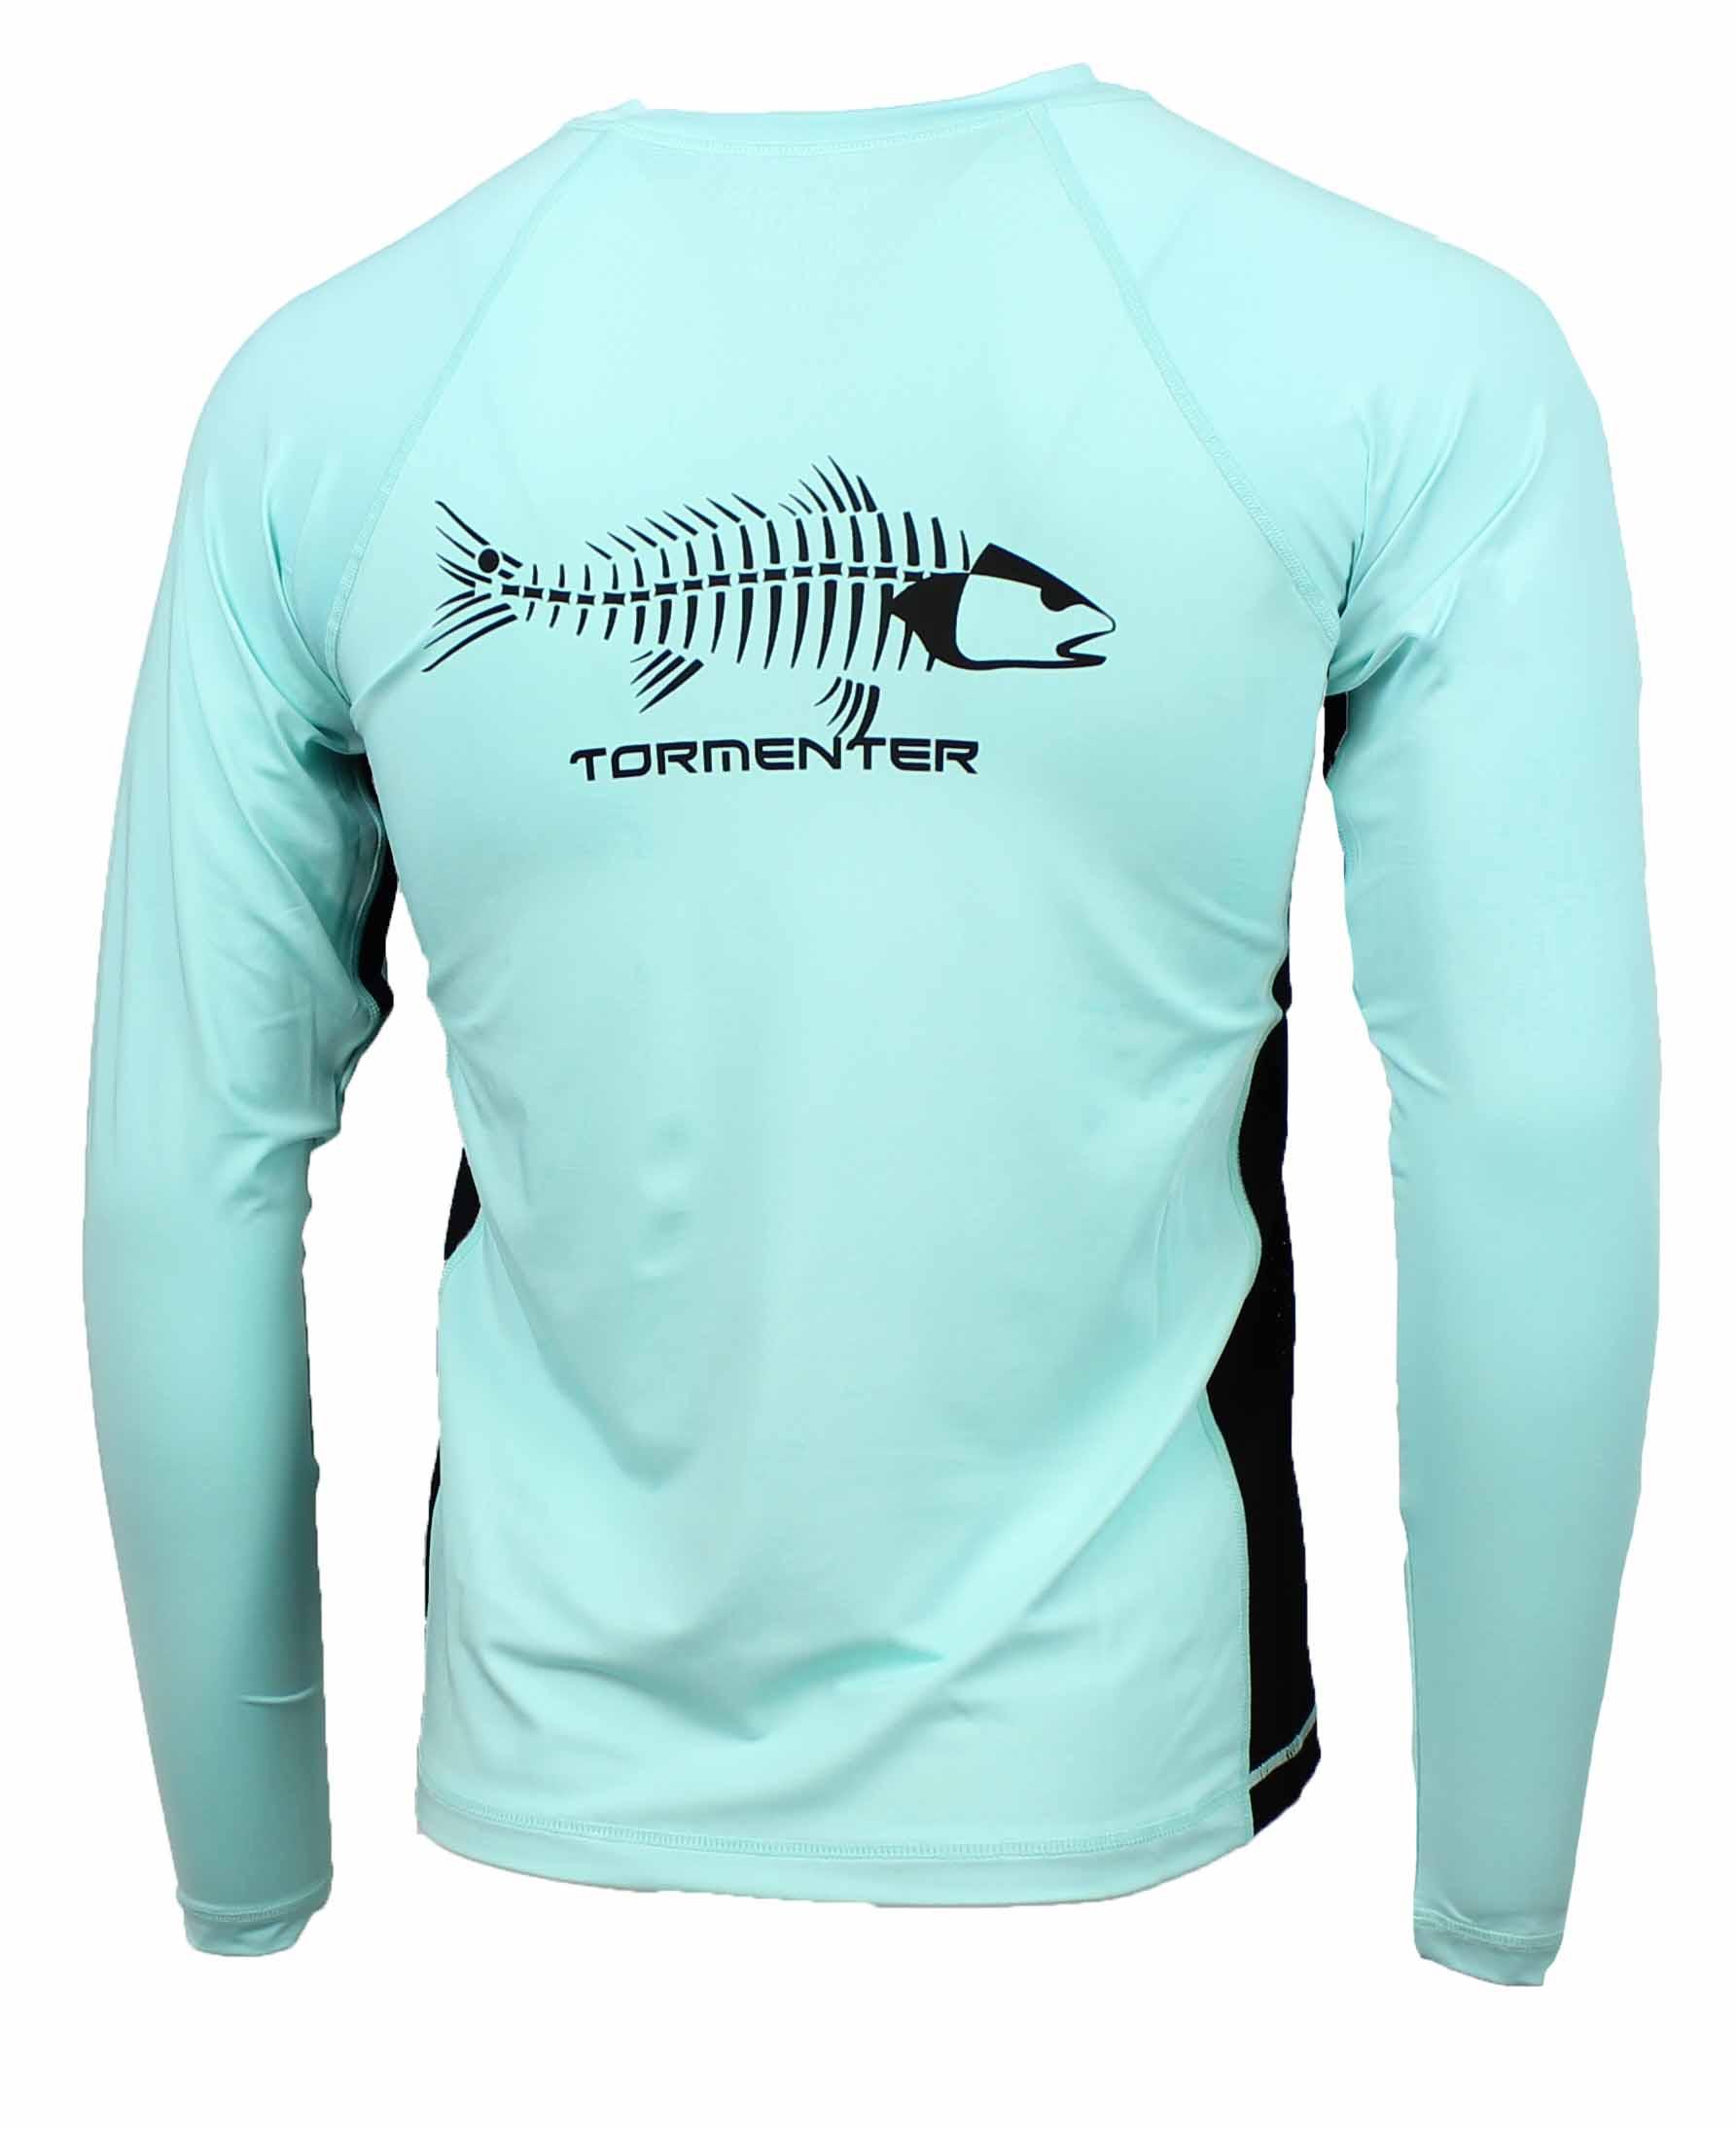 Tormenter men 39 s spf 50 long sleeve fishing shirt ebay for Long sleeve fishing shirts